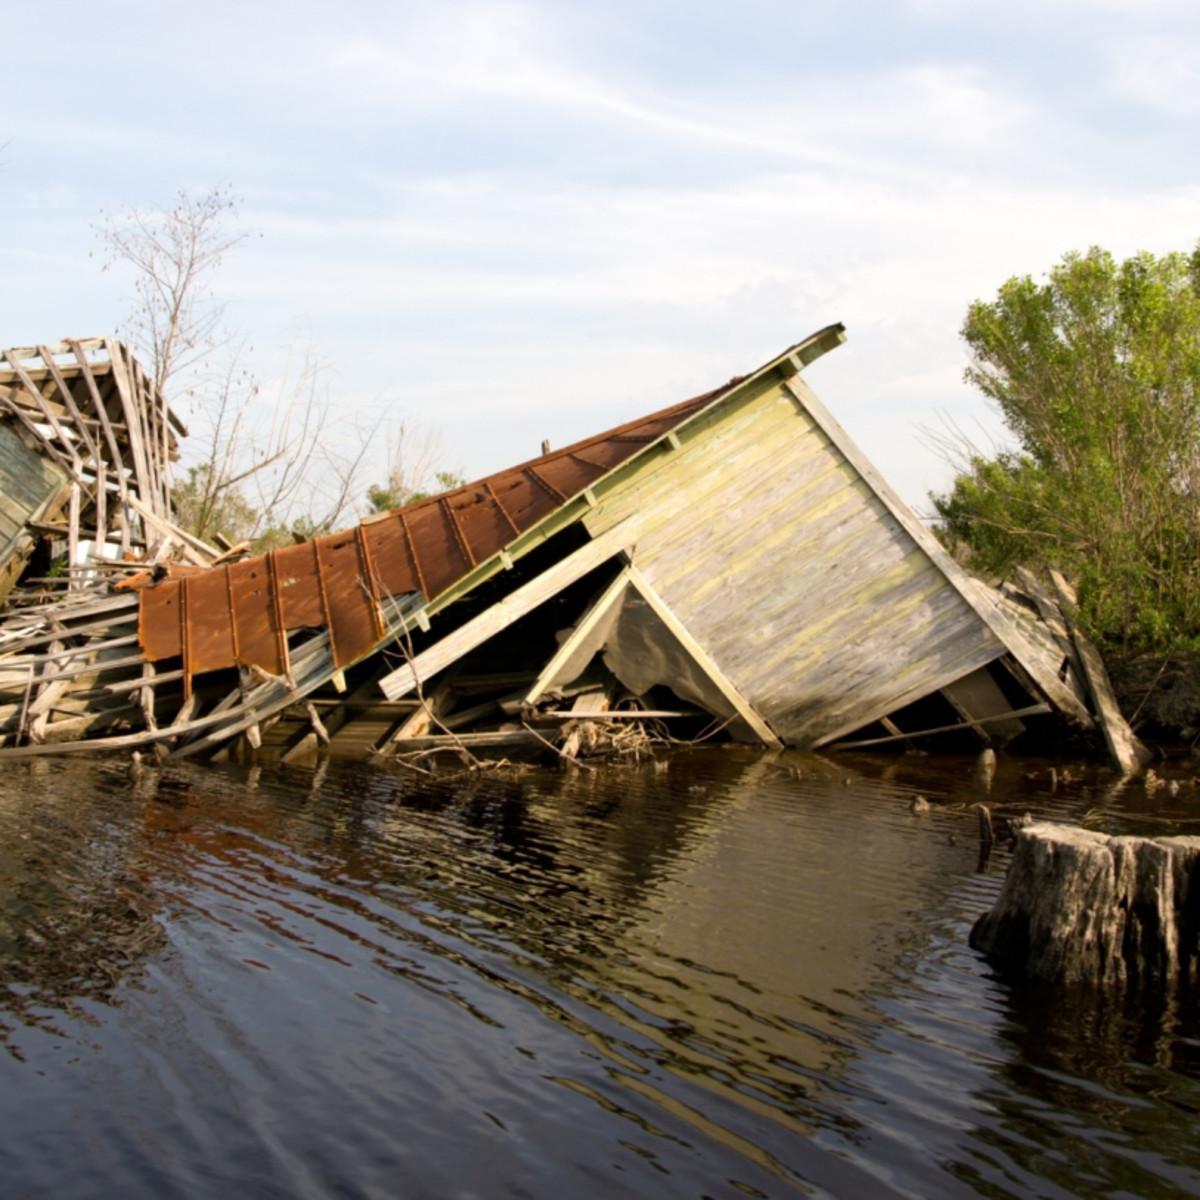 11 Facts About Hurricane Katrina | DoSomething.org